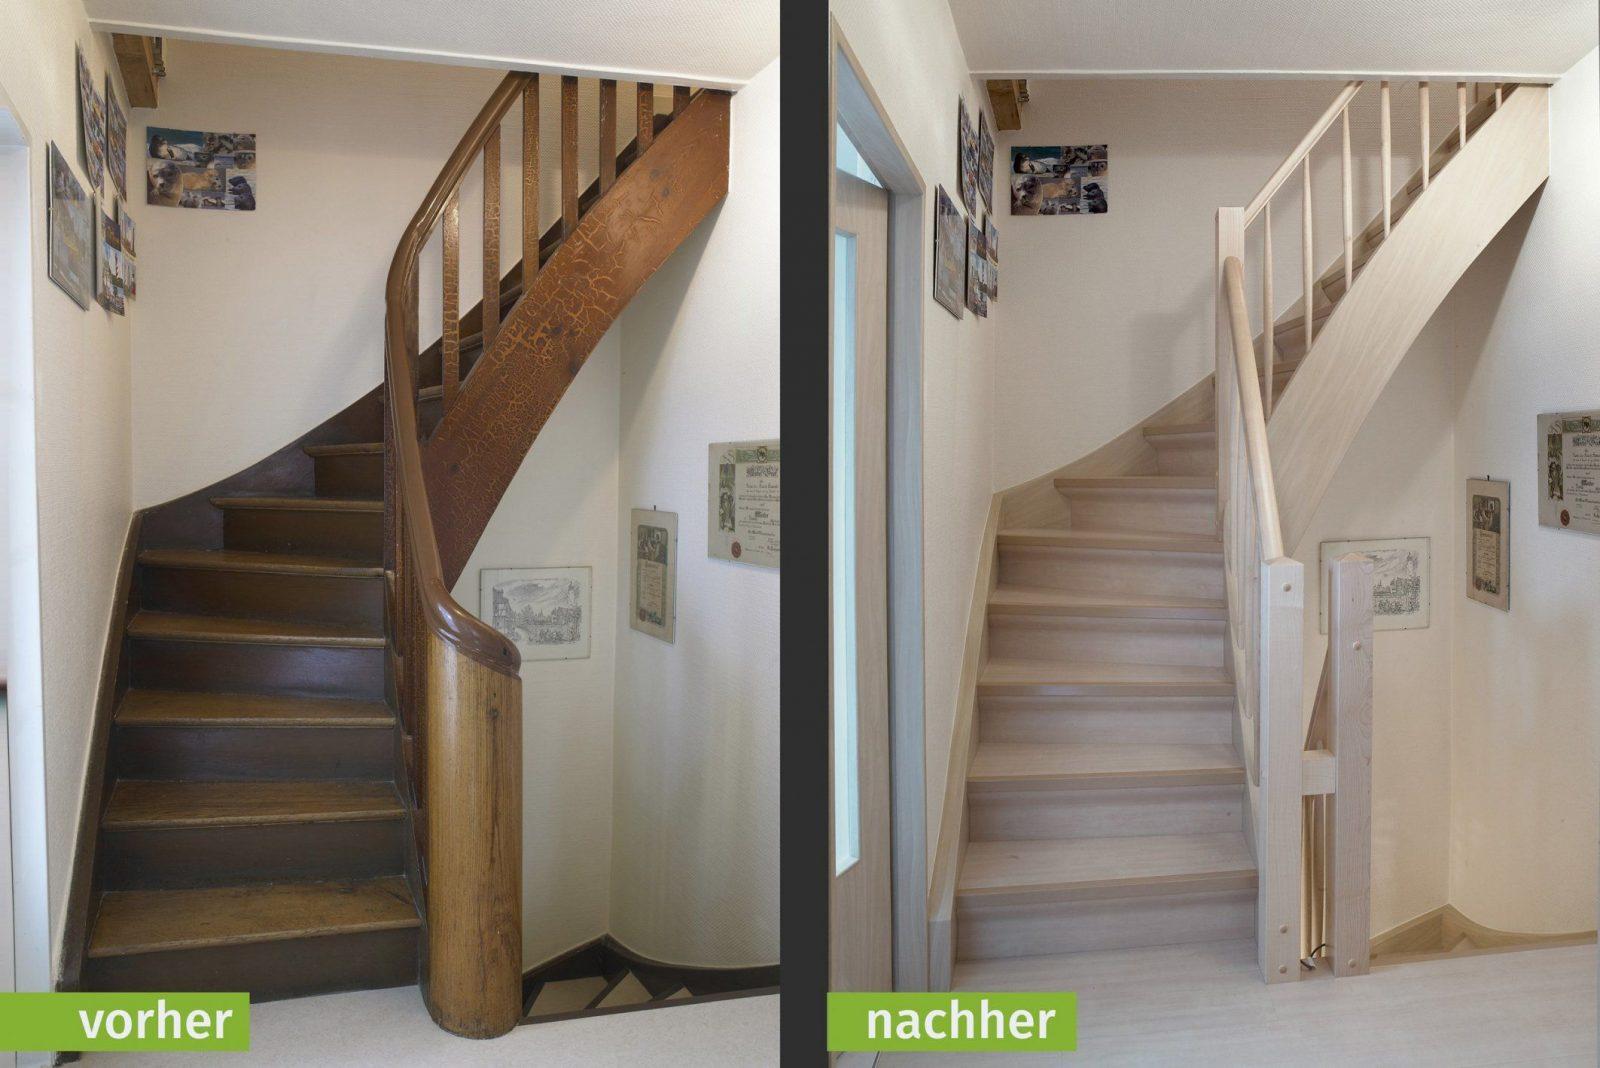 Fabelhafte Treppe Zum Spitzboden Treppe Renovieren Vorher Nachher von Treppe Renovieren Vorher Nachher Photo